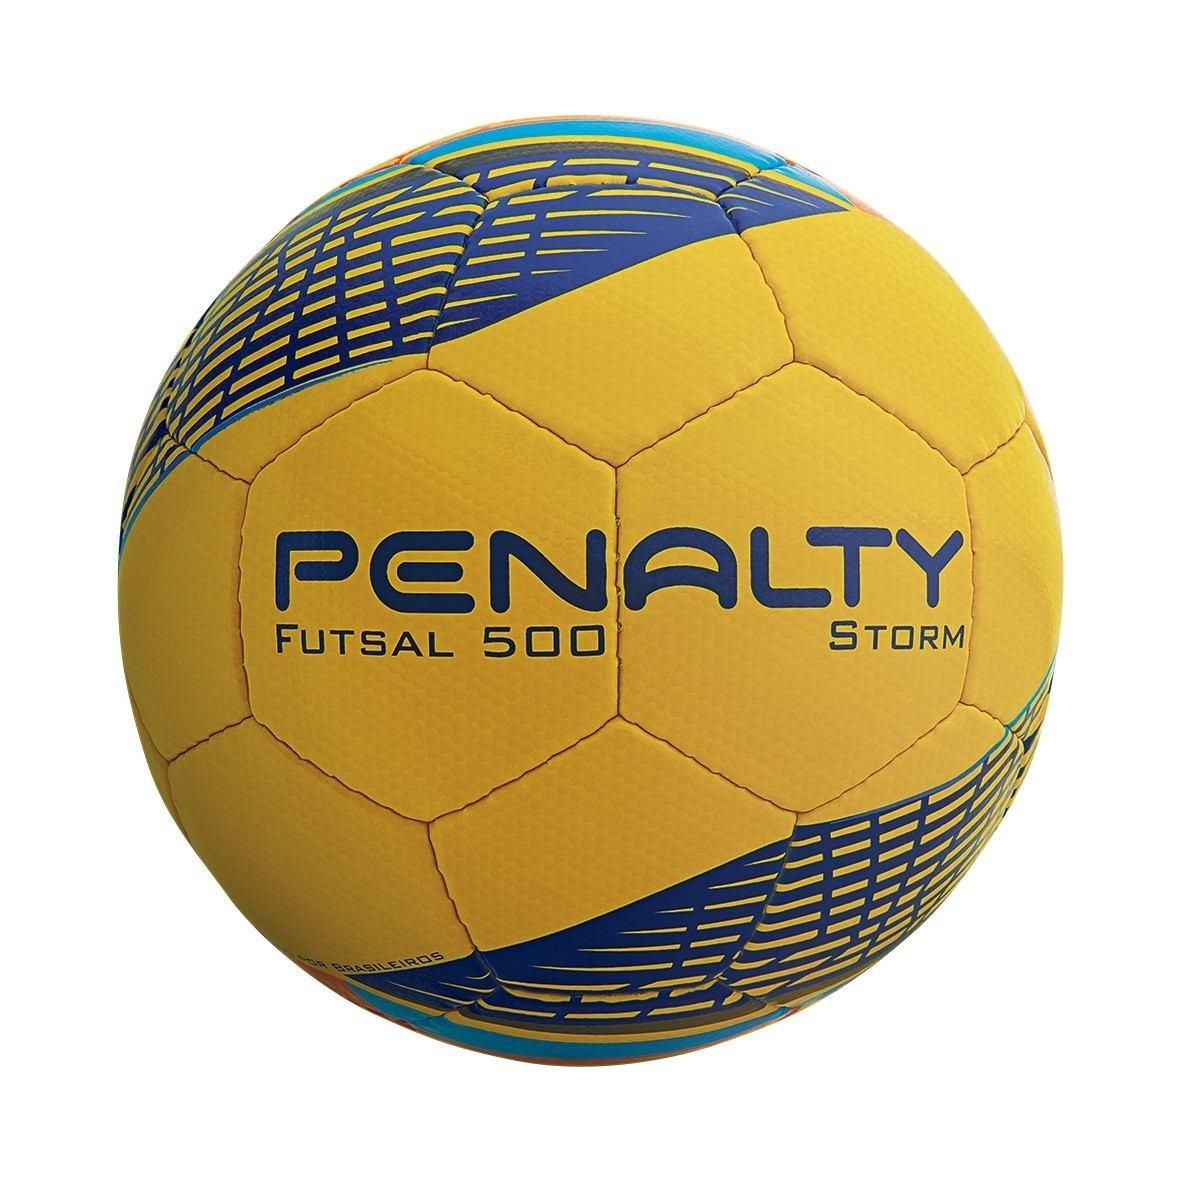 pelota penalty futsal nro 3 storm cosida a mano nesport. Cargando zoom. 47108ffb3966c